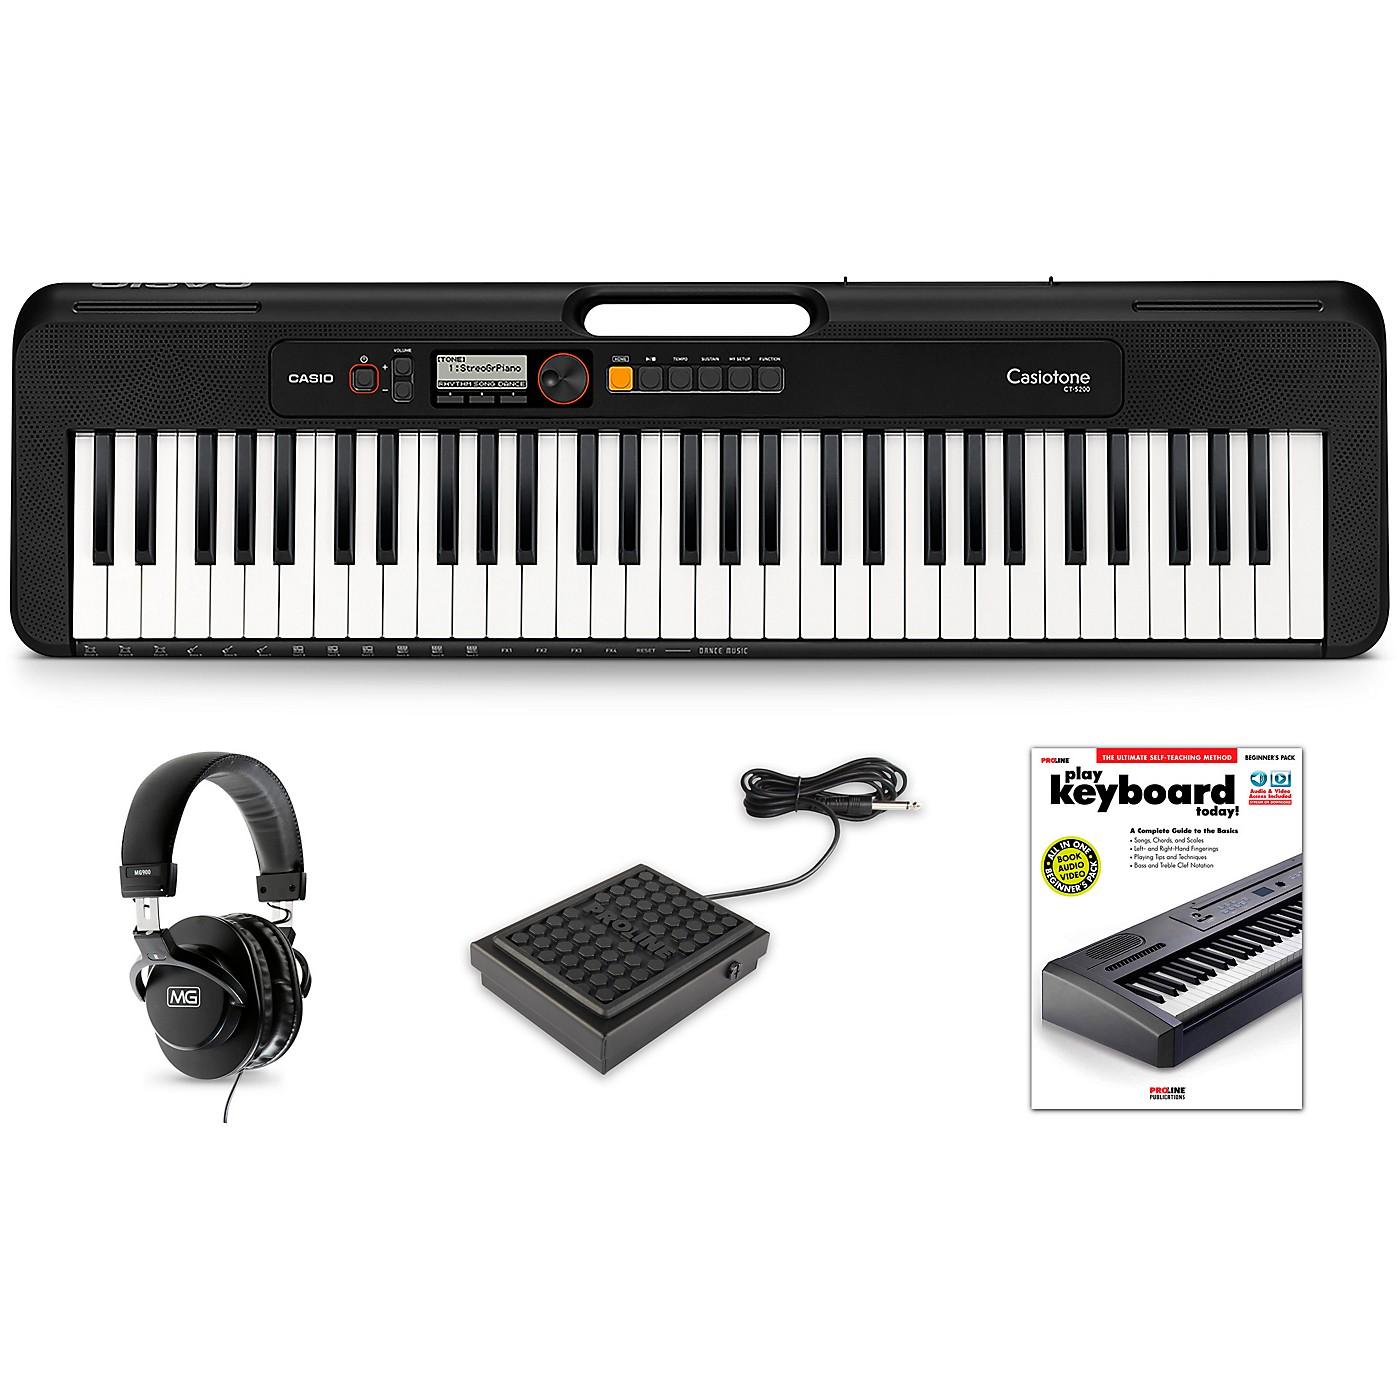 Casio Casiotone CT-S200 Keyboard Essentials Kit thumbnail